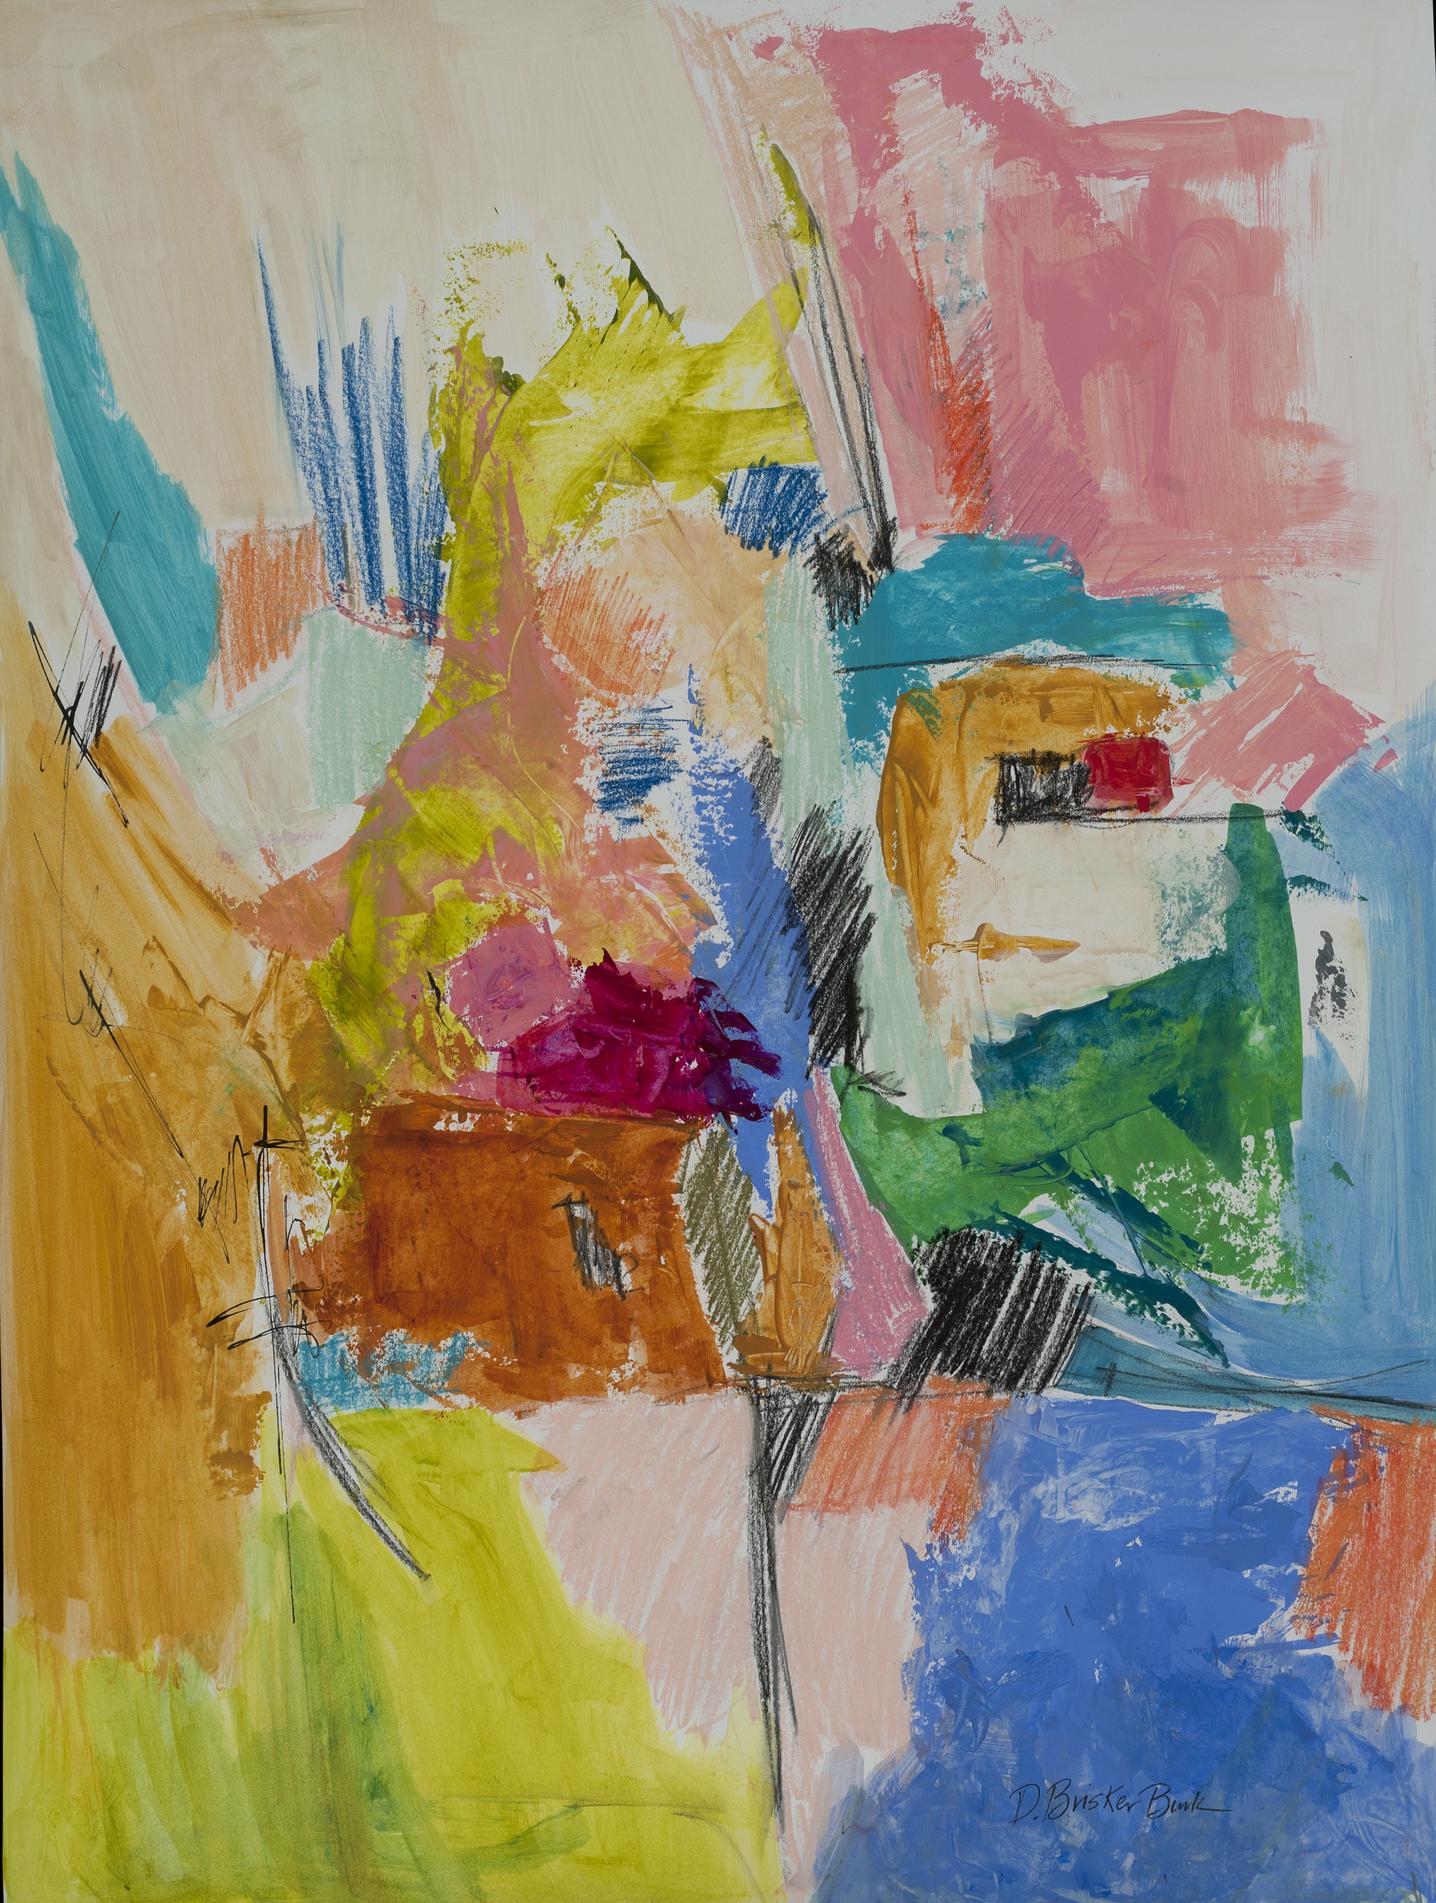 Extensions XIV,with brights, 20X26 by Deborah  Brisker Burk